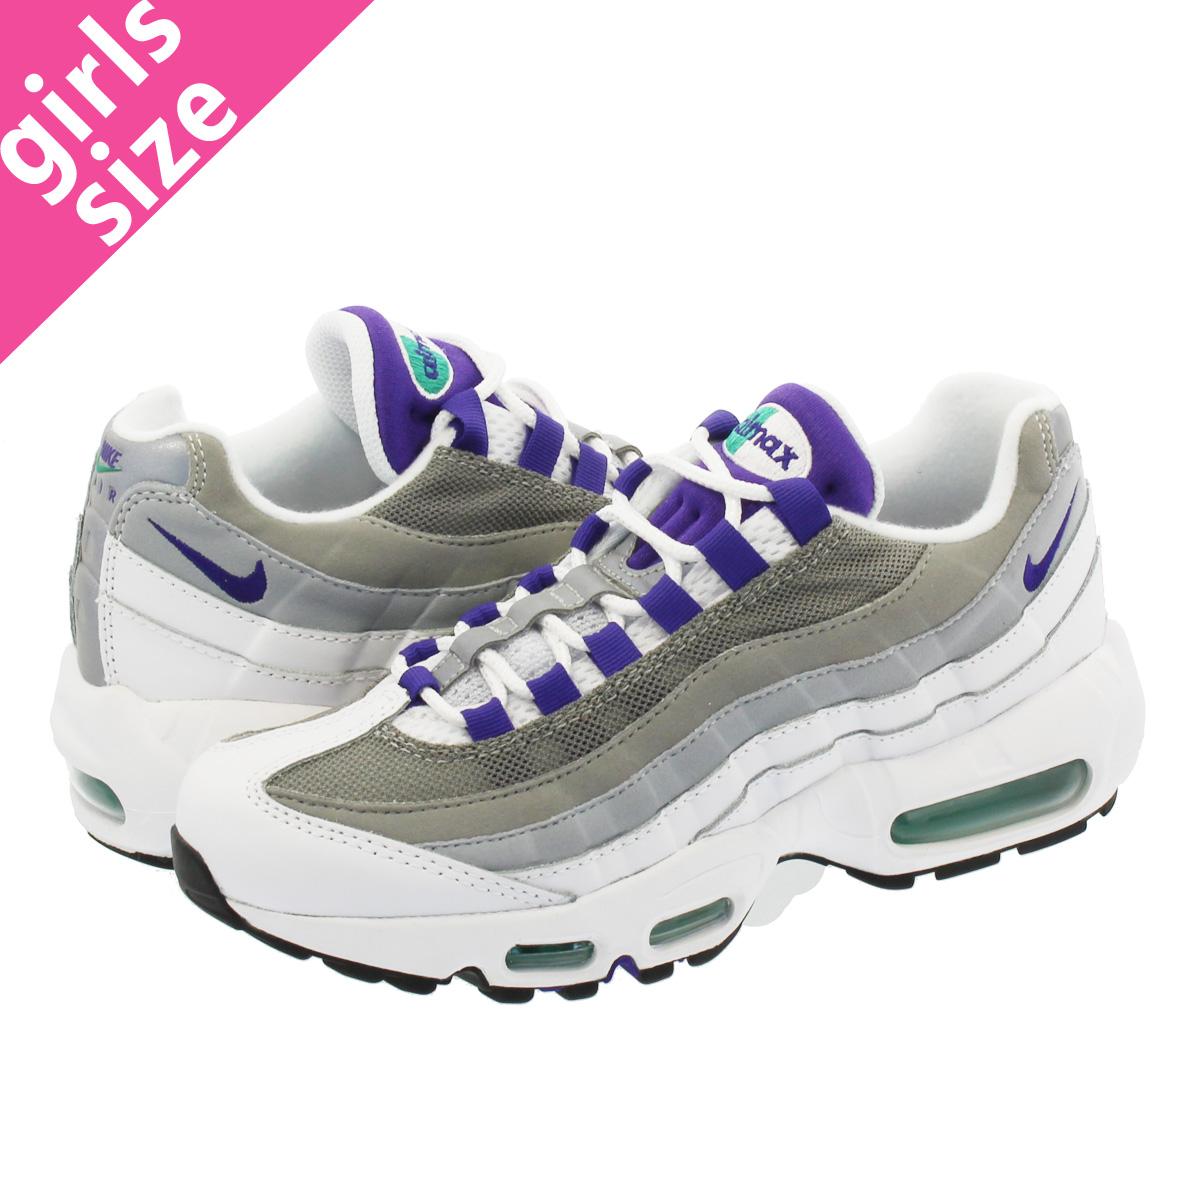 Nike Women S Shoes Paste